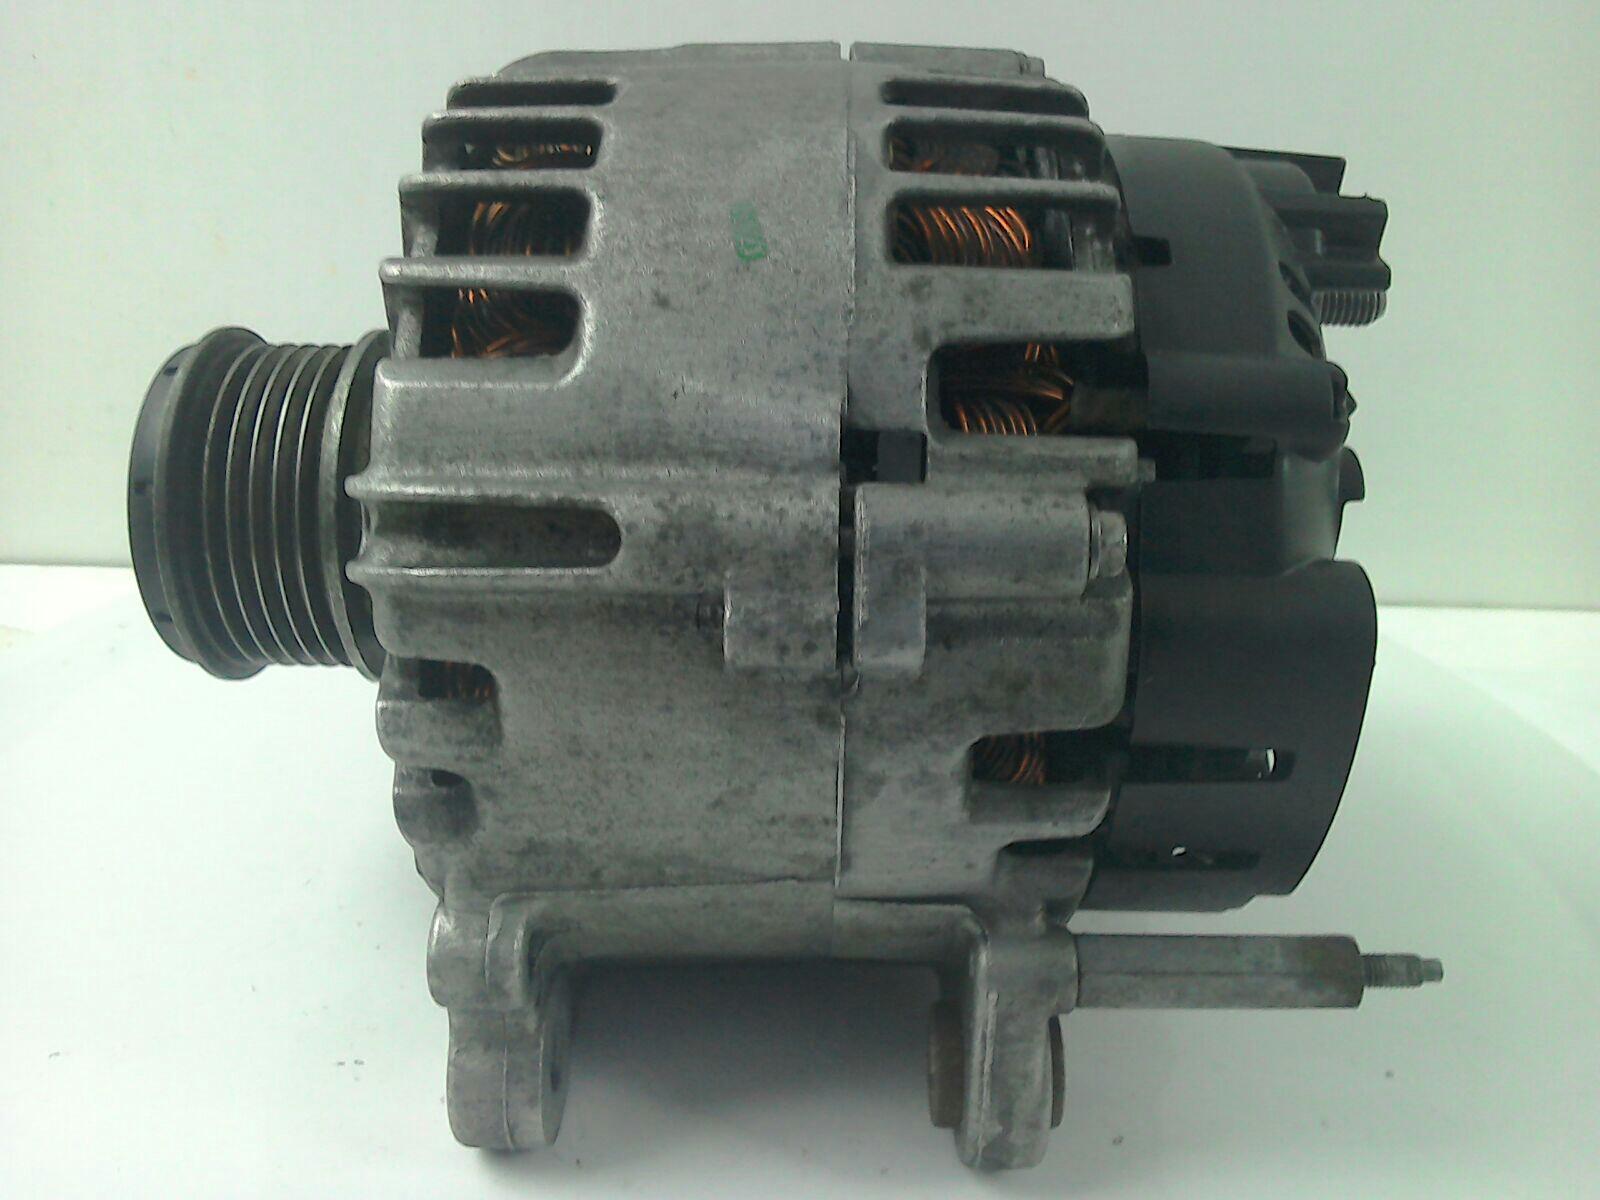 audi a3 2008 to 2013 alternator diesel manual for sale from scb rh scbvehicledismantlers co uk Audi A3 V6 Audi A3 TDI